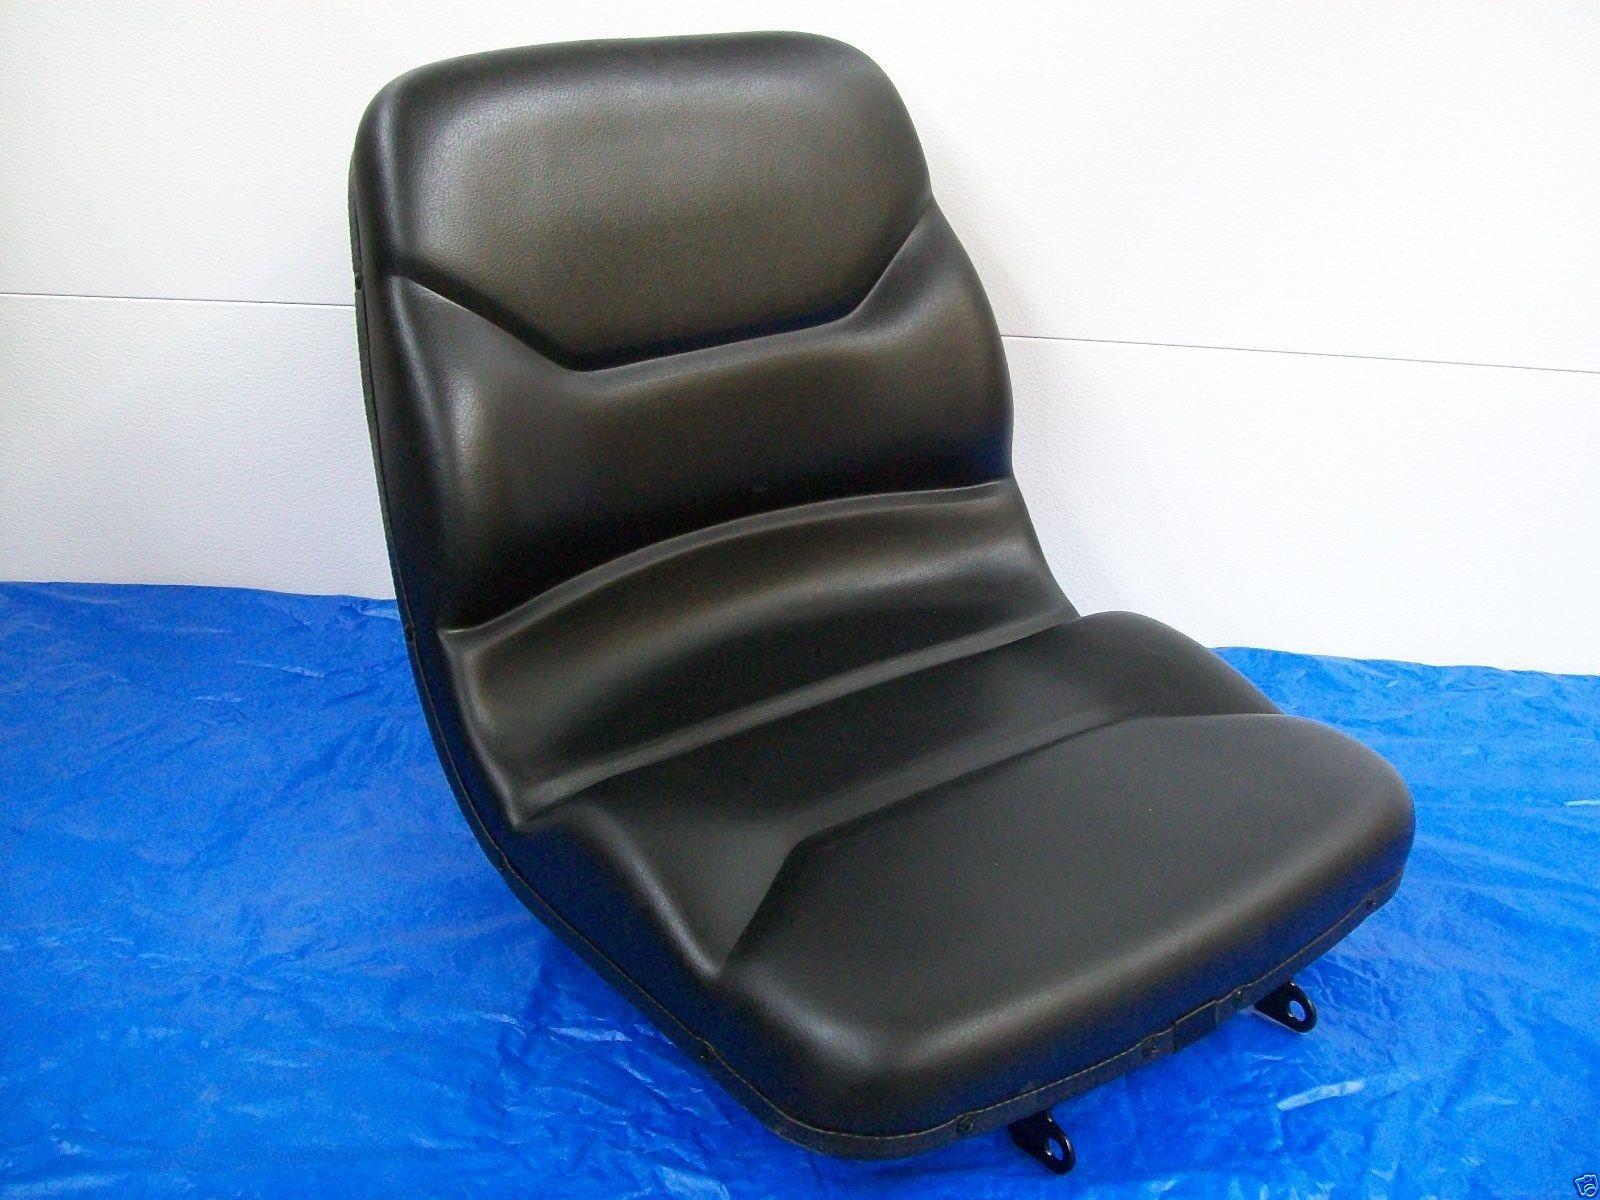 Black Seat Fits John Deere Compact Tractor 670 770 790 870 970 Wiring Diagram 990 1070 3005 Fo